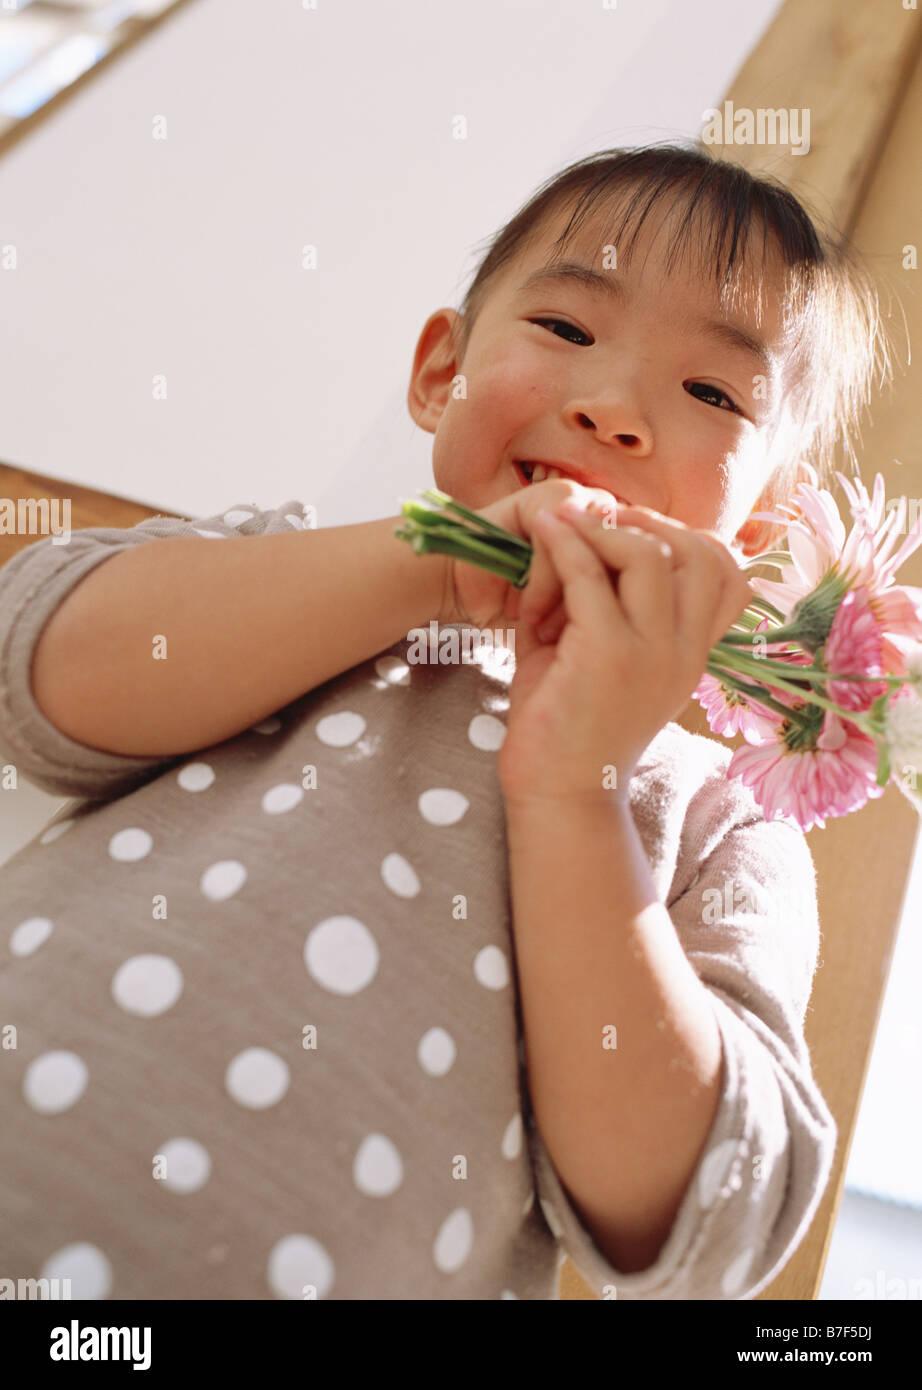 Girl holding flowers Stock Photo